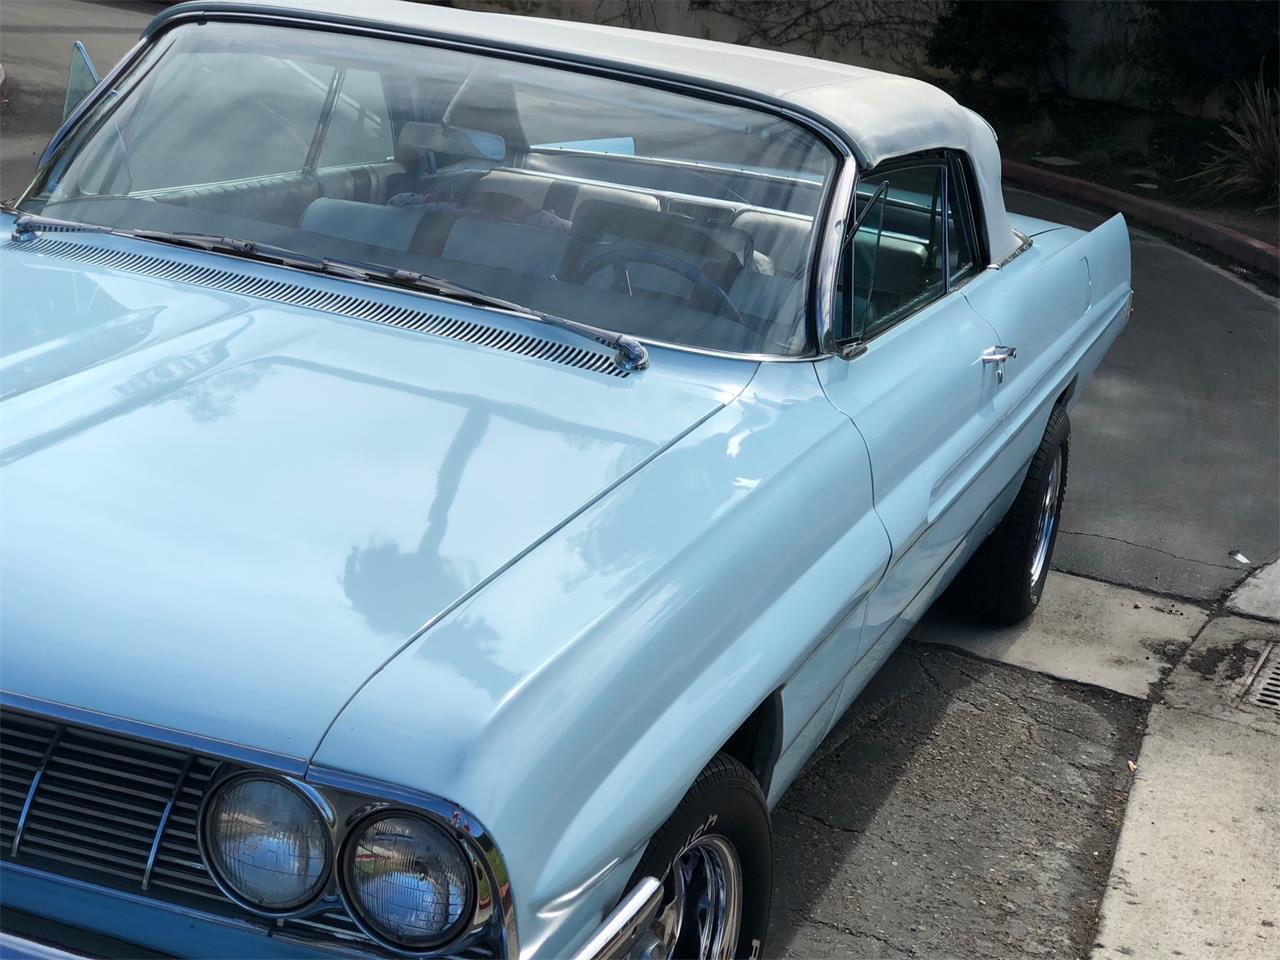 Large Picture of Classic 1961 Bonneville located in Cot de Caza California - ASQZ